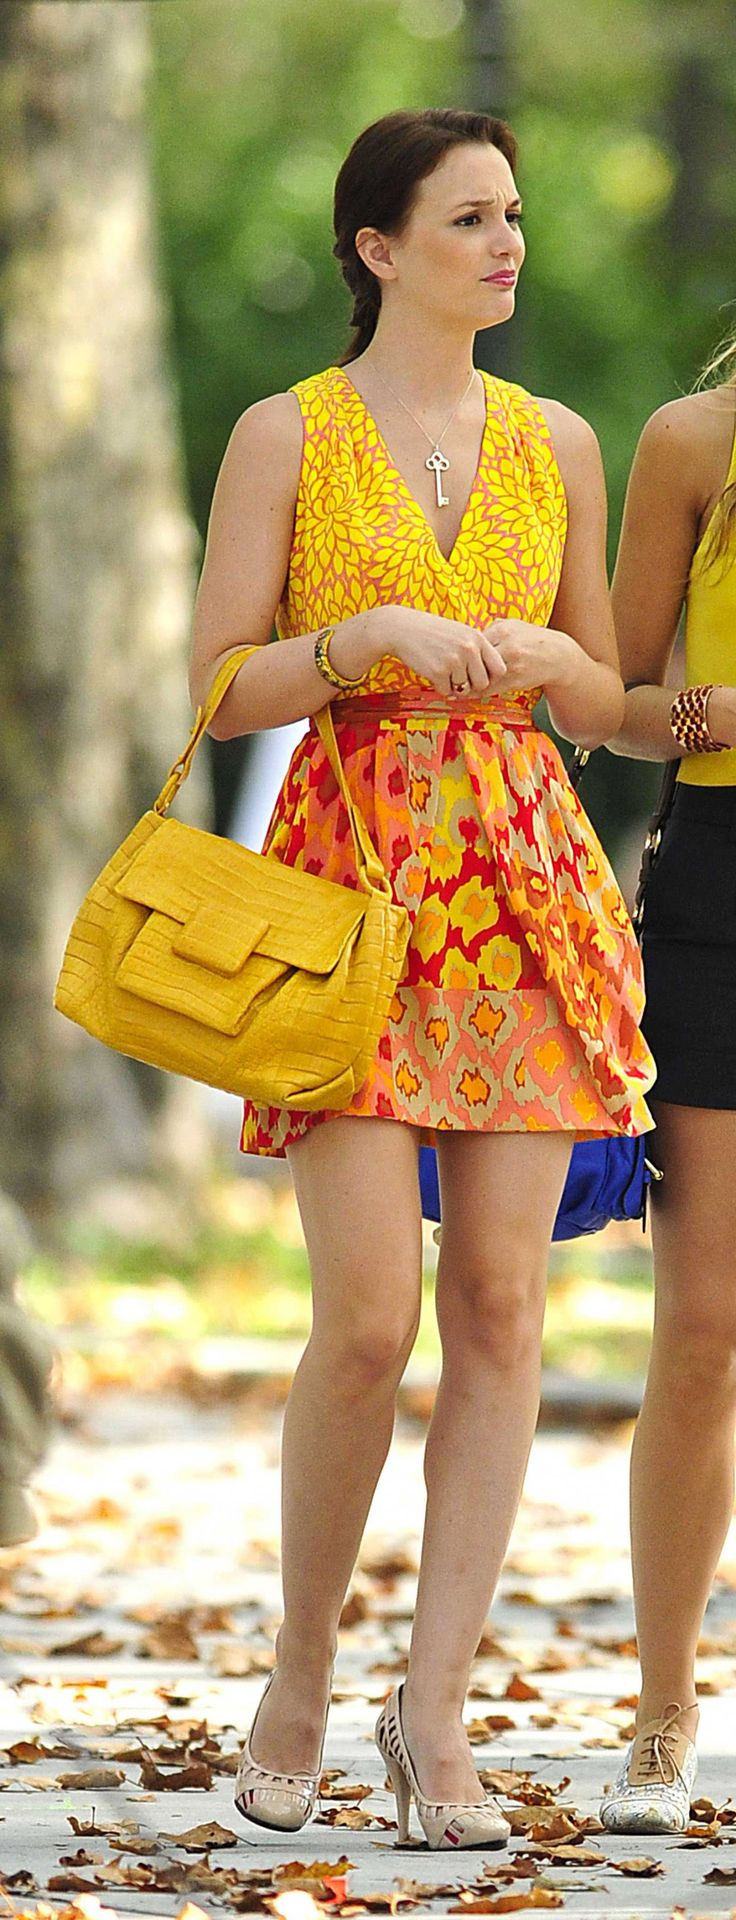 Style de Blair Waldorf : le look coloré